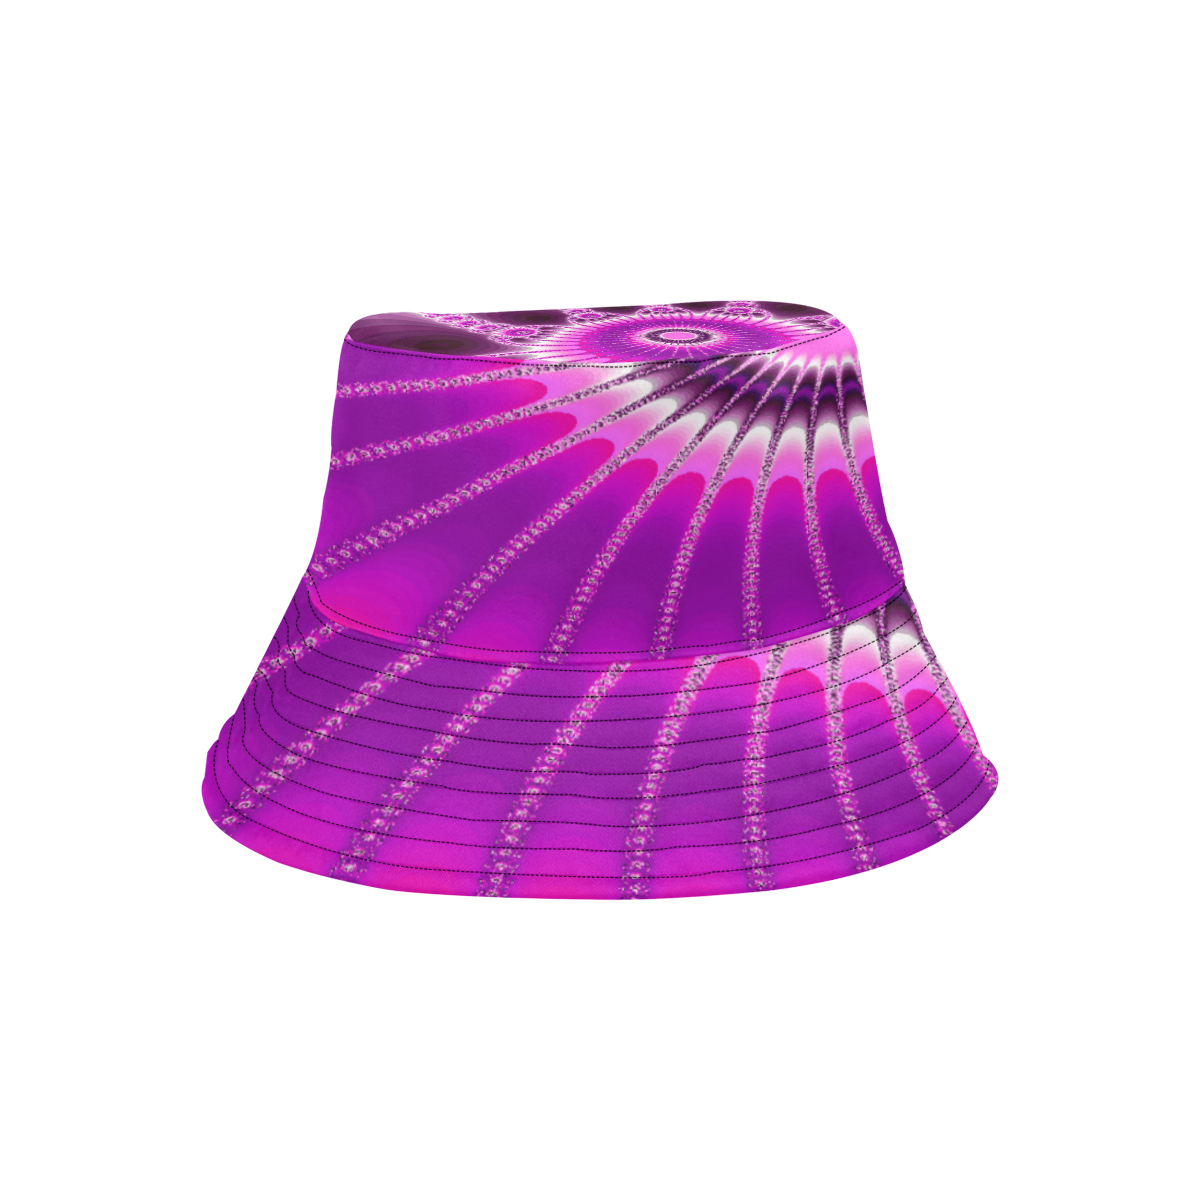 Fuchsia Sunflower All Over Print Bucket Hat